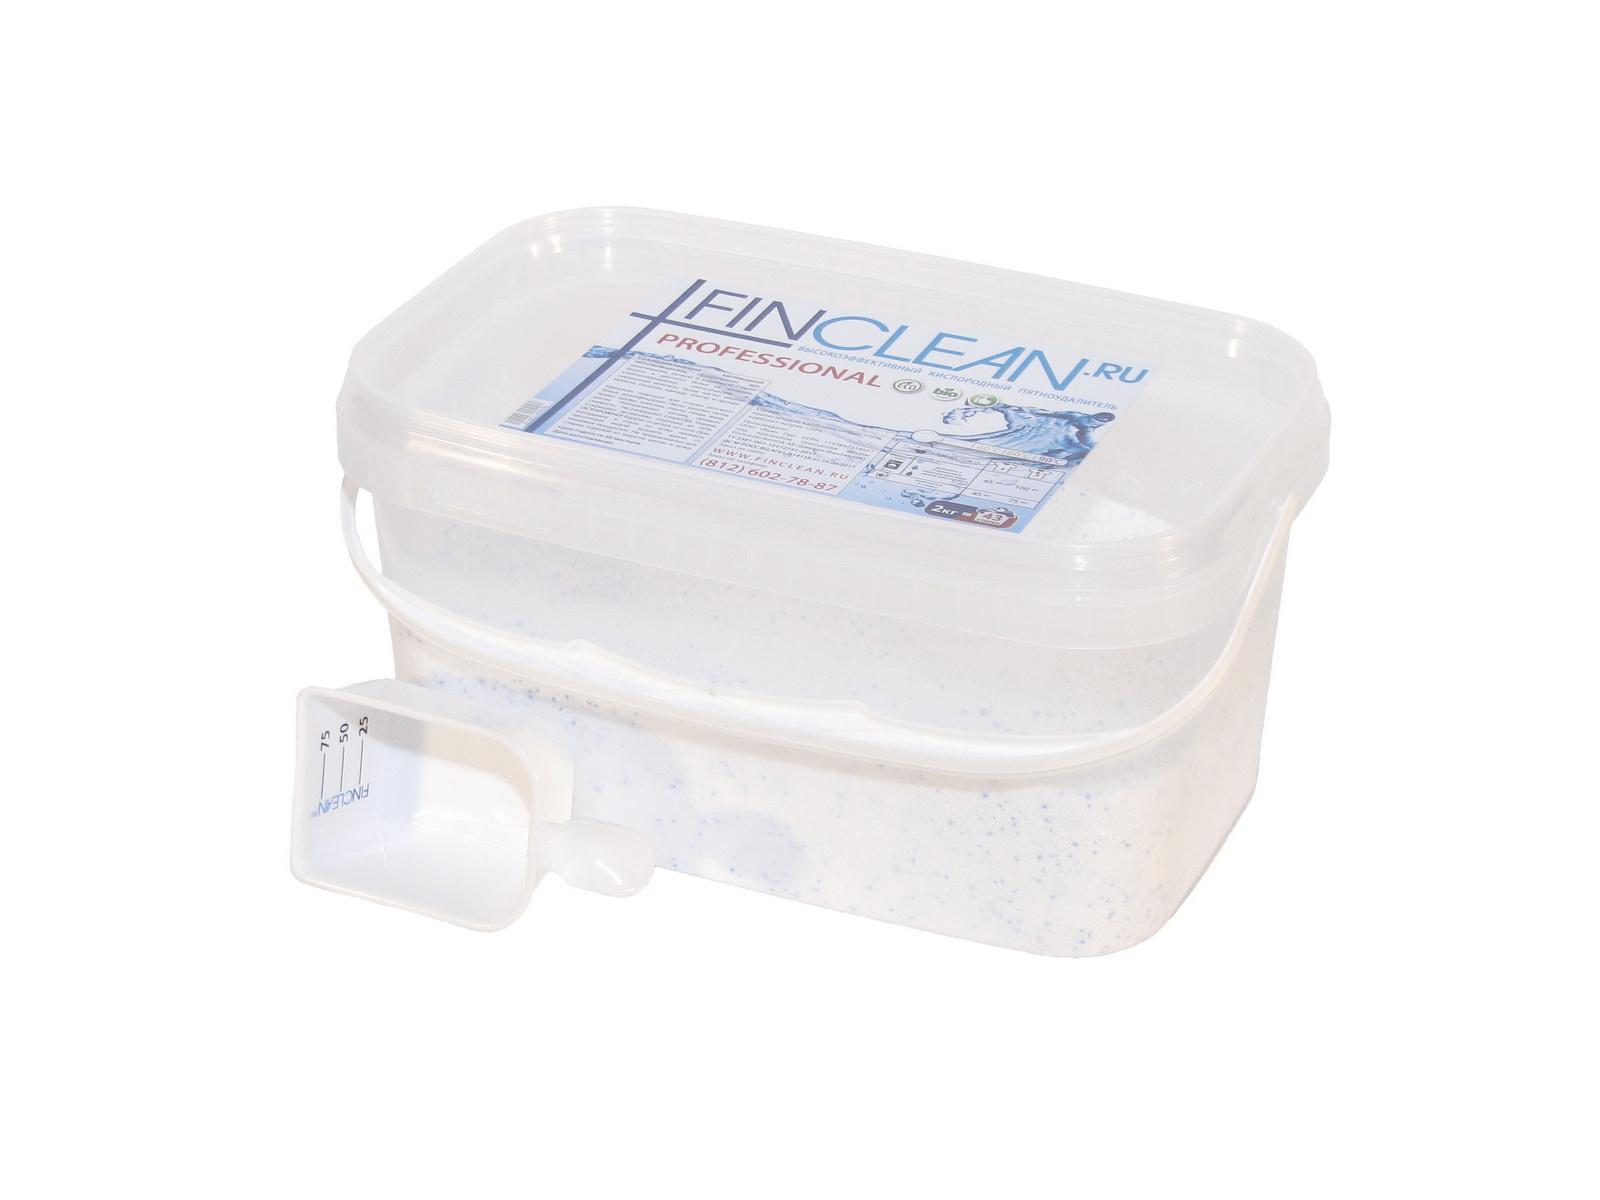 Пятноудалитель FINCLEAN.RU Professional Oxy-Eco, 120132, 2 кг